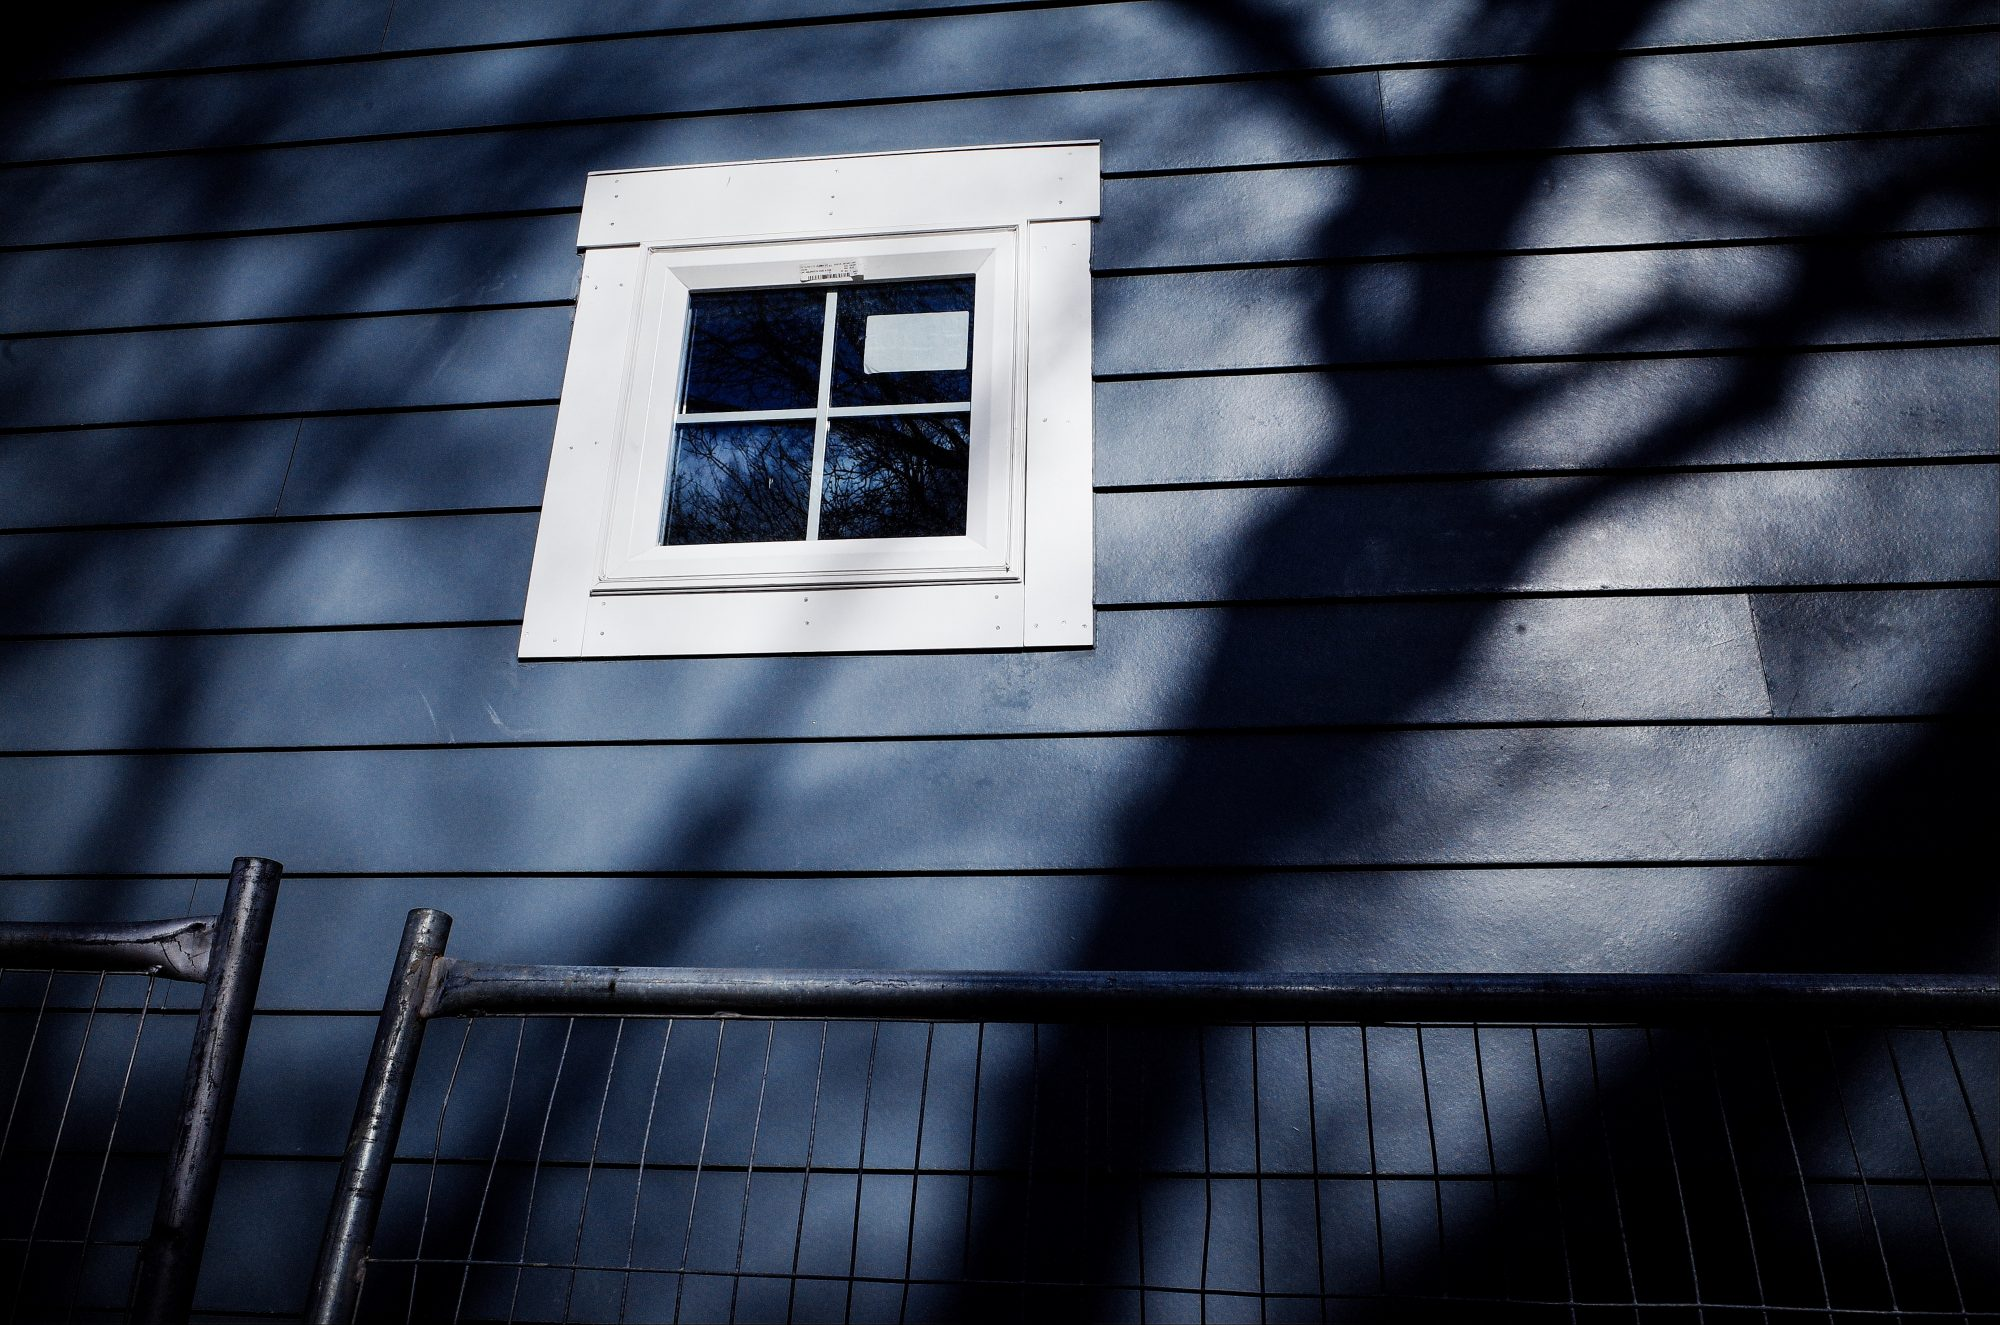 tree and window. Boston, 2018